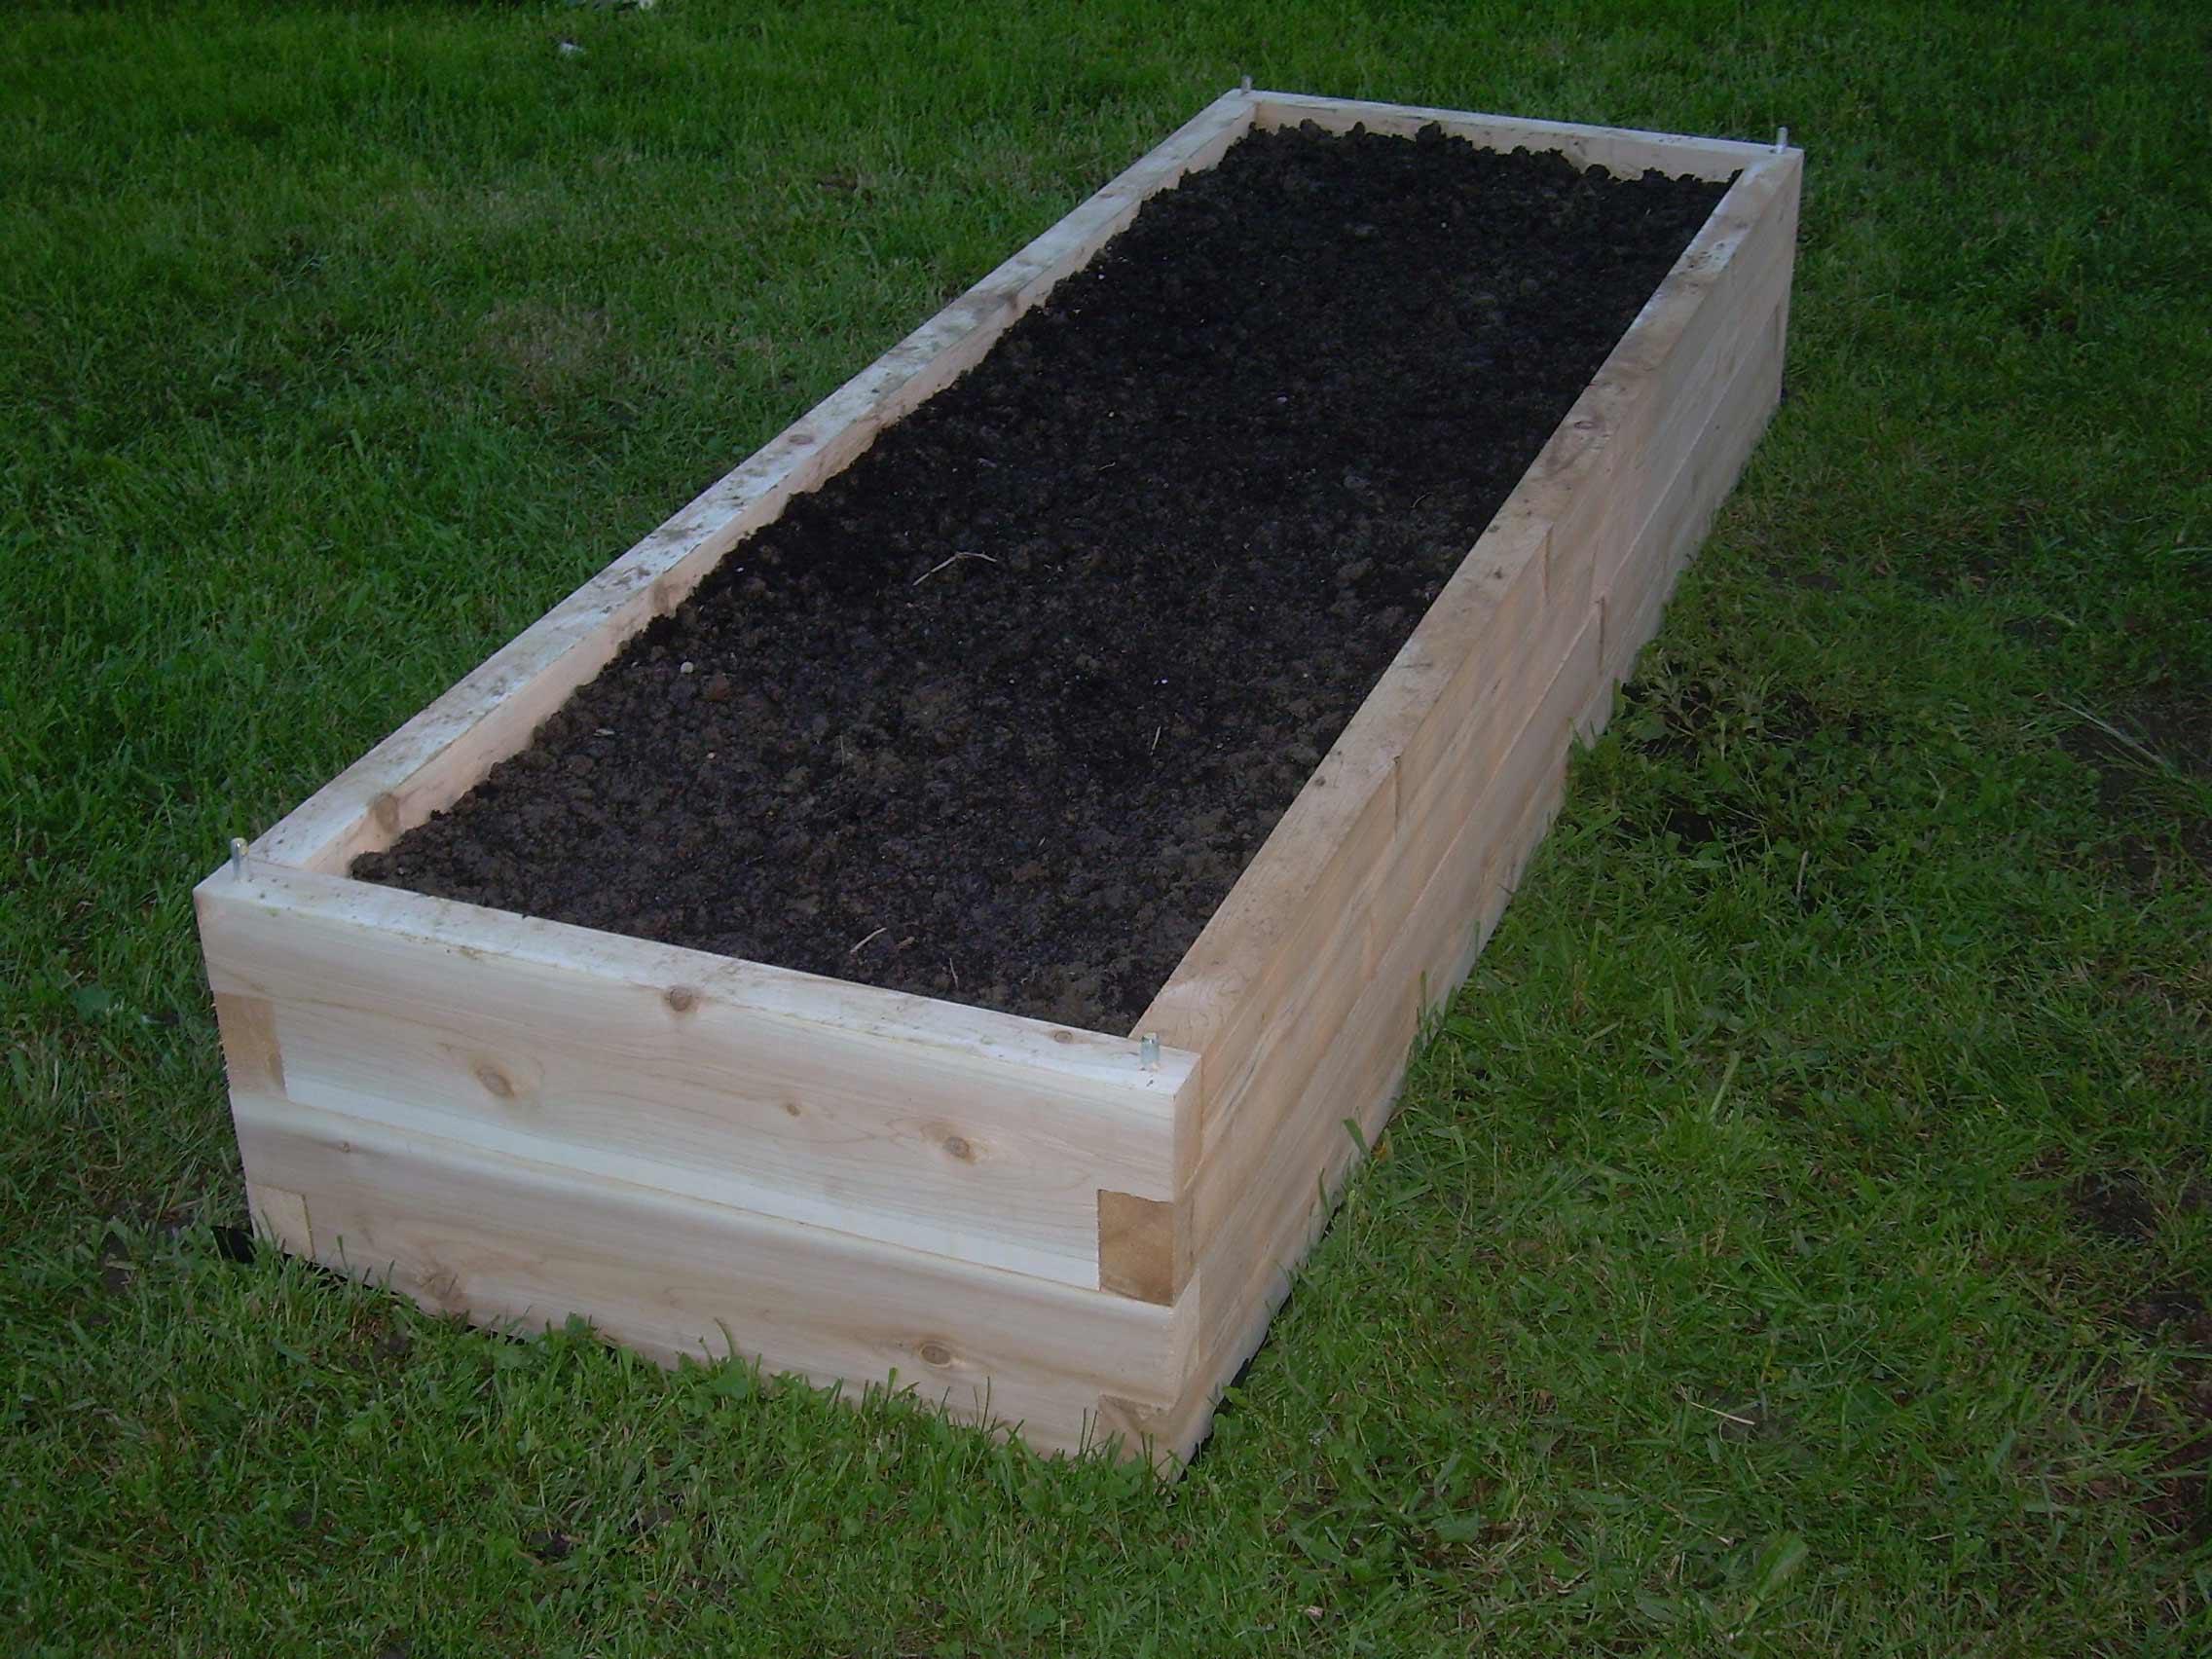 Raised Bed Garden Kits Home Depot Terrasse En Bois